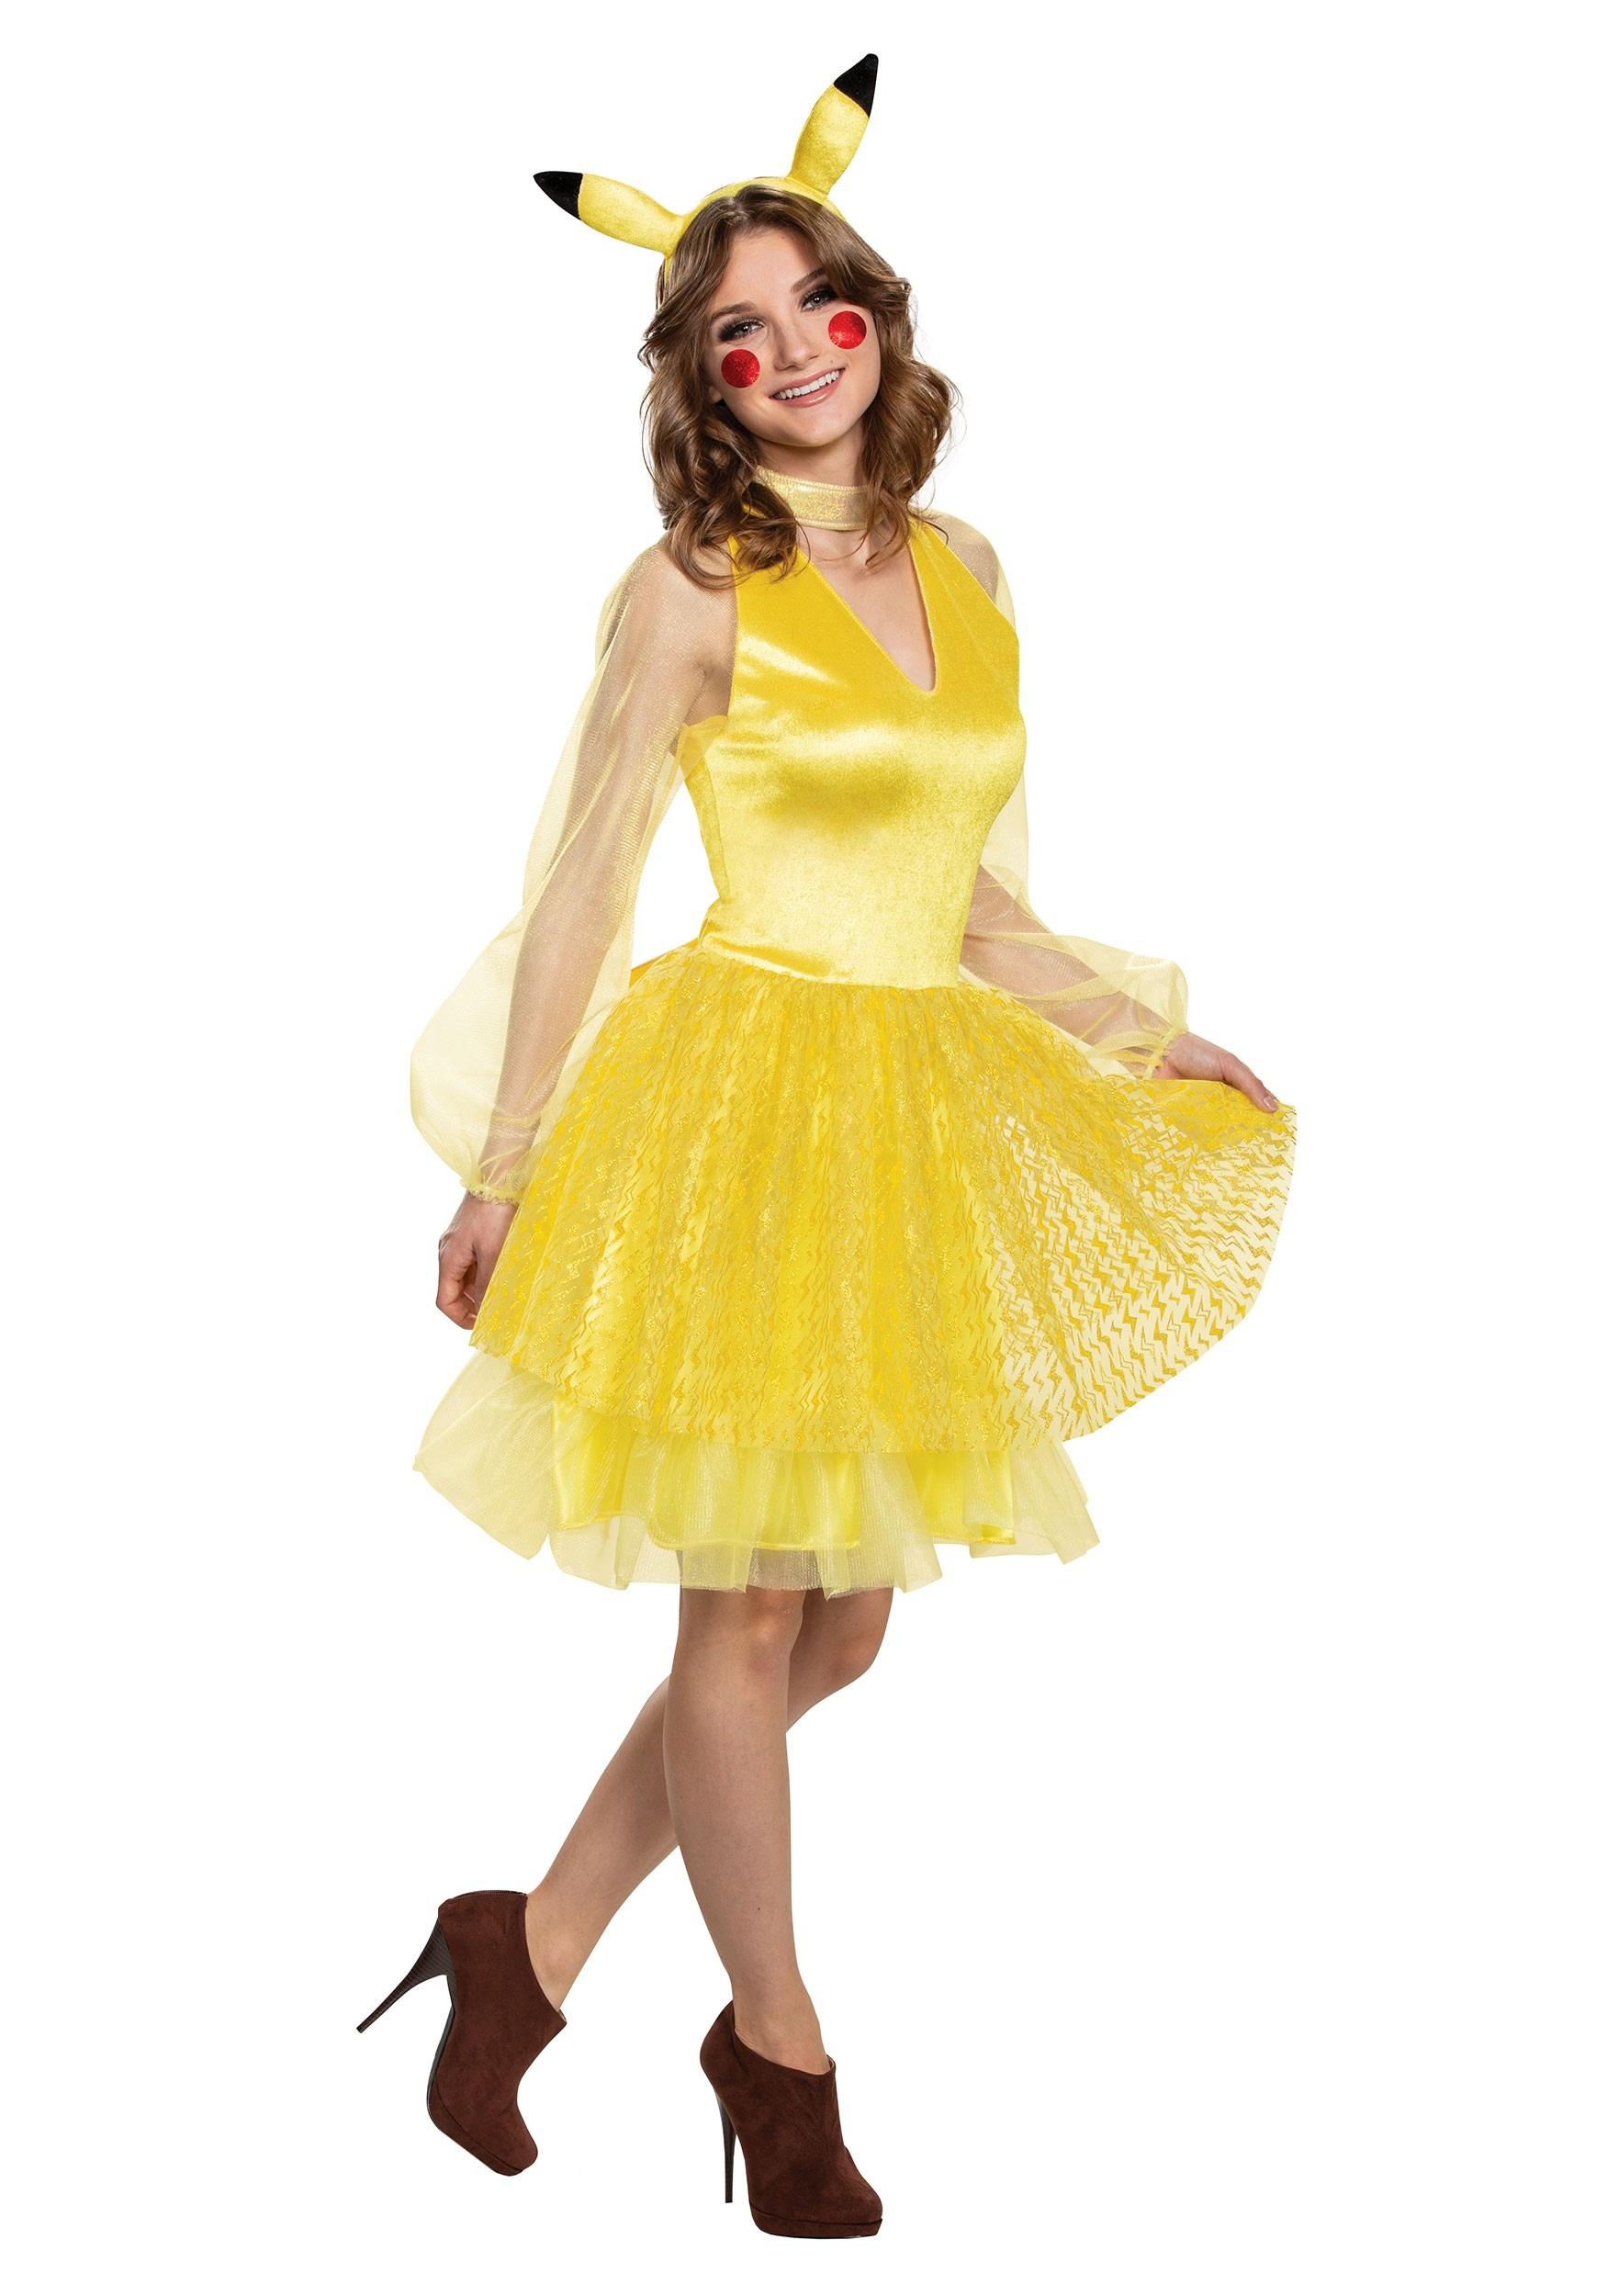 Women's Pokemon Pikachu Deluxe Costume